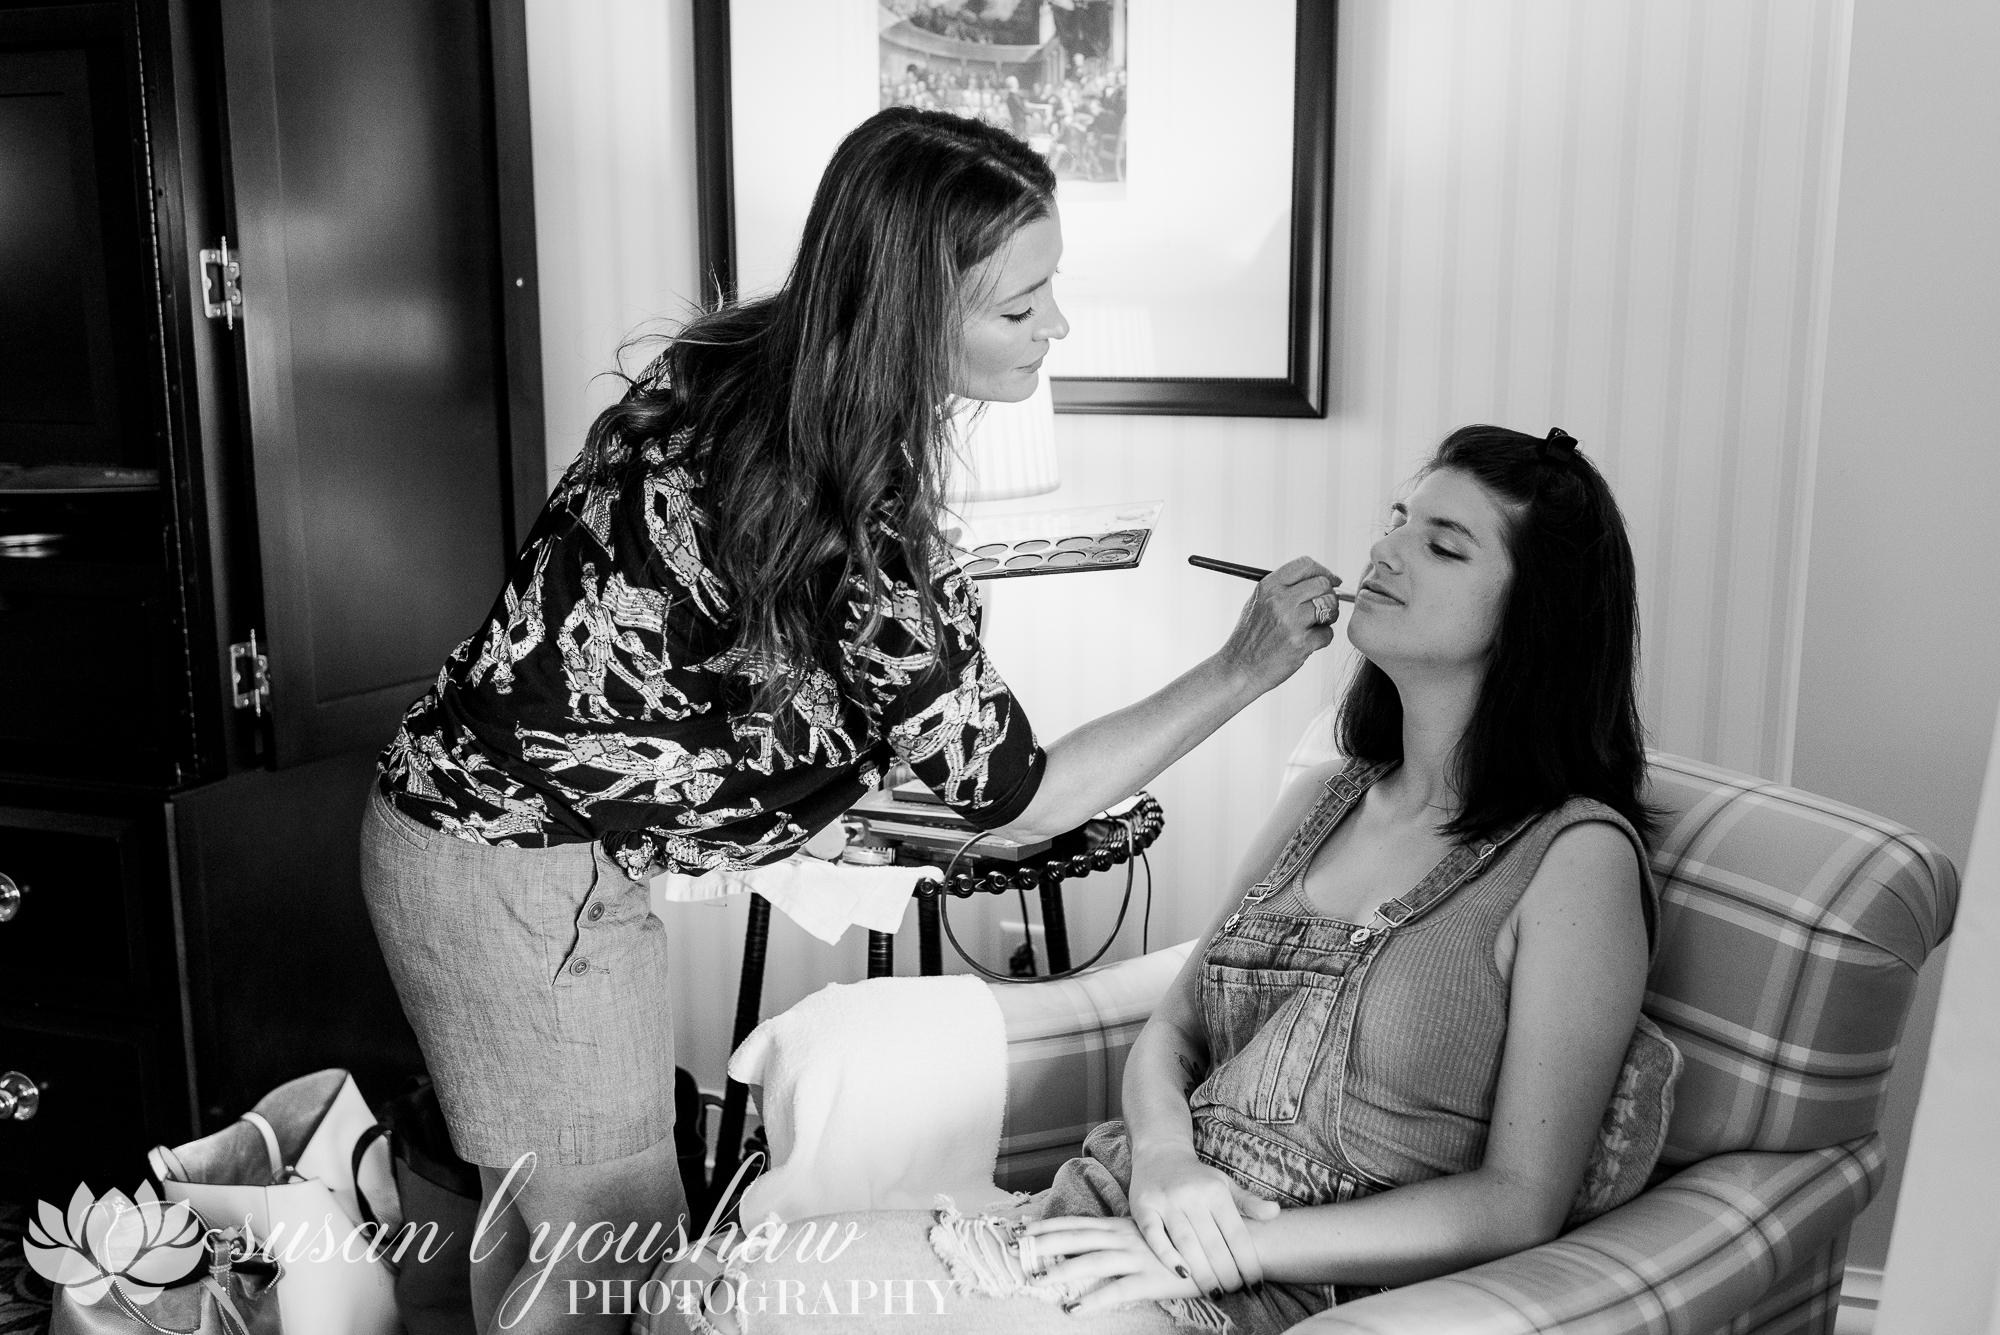 BLOG Carolyn Adams and Jim McCune 07-04-2018 SLY Photography-1.jpg